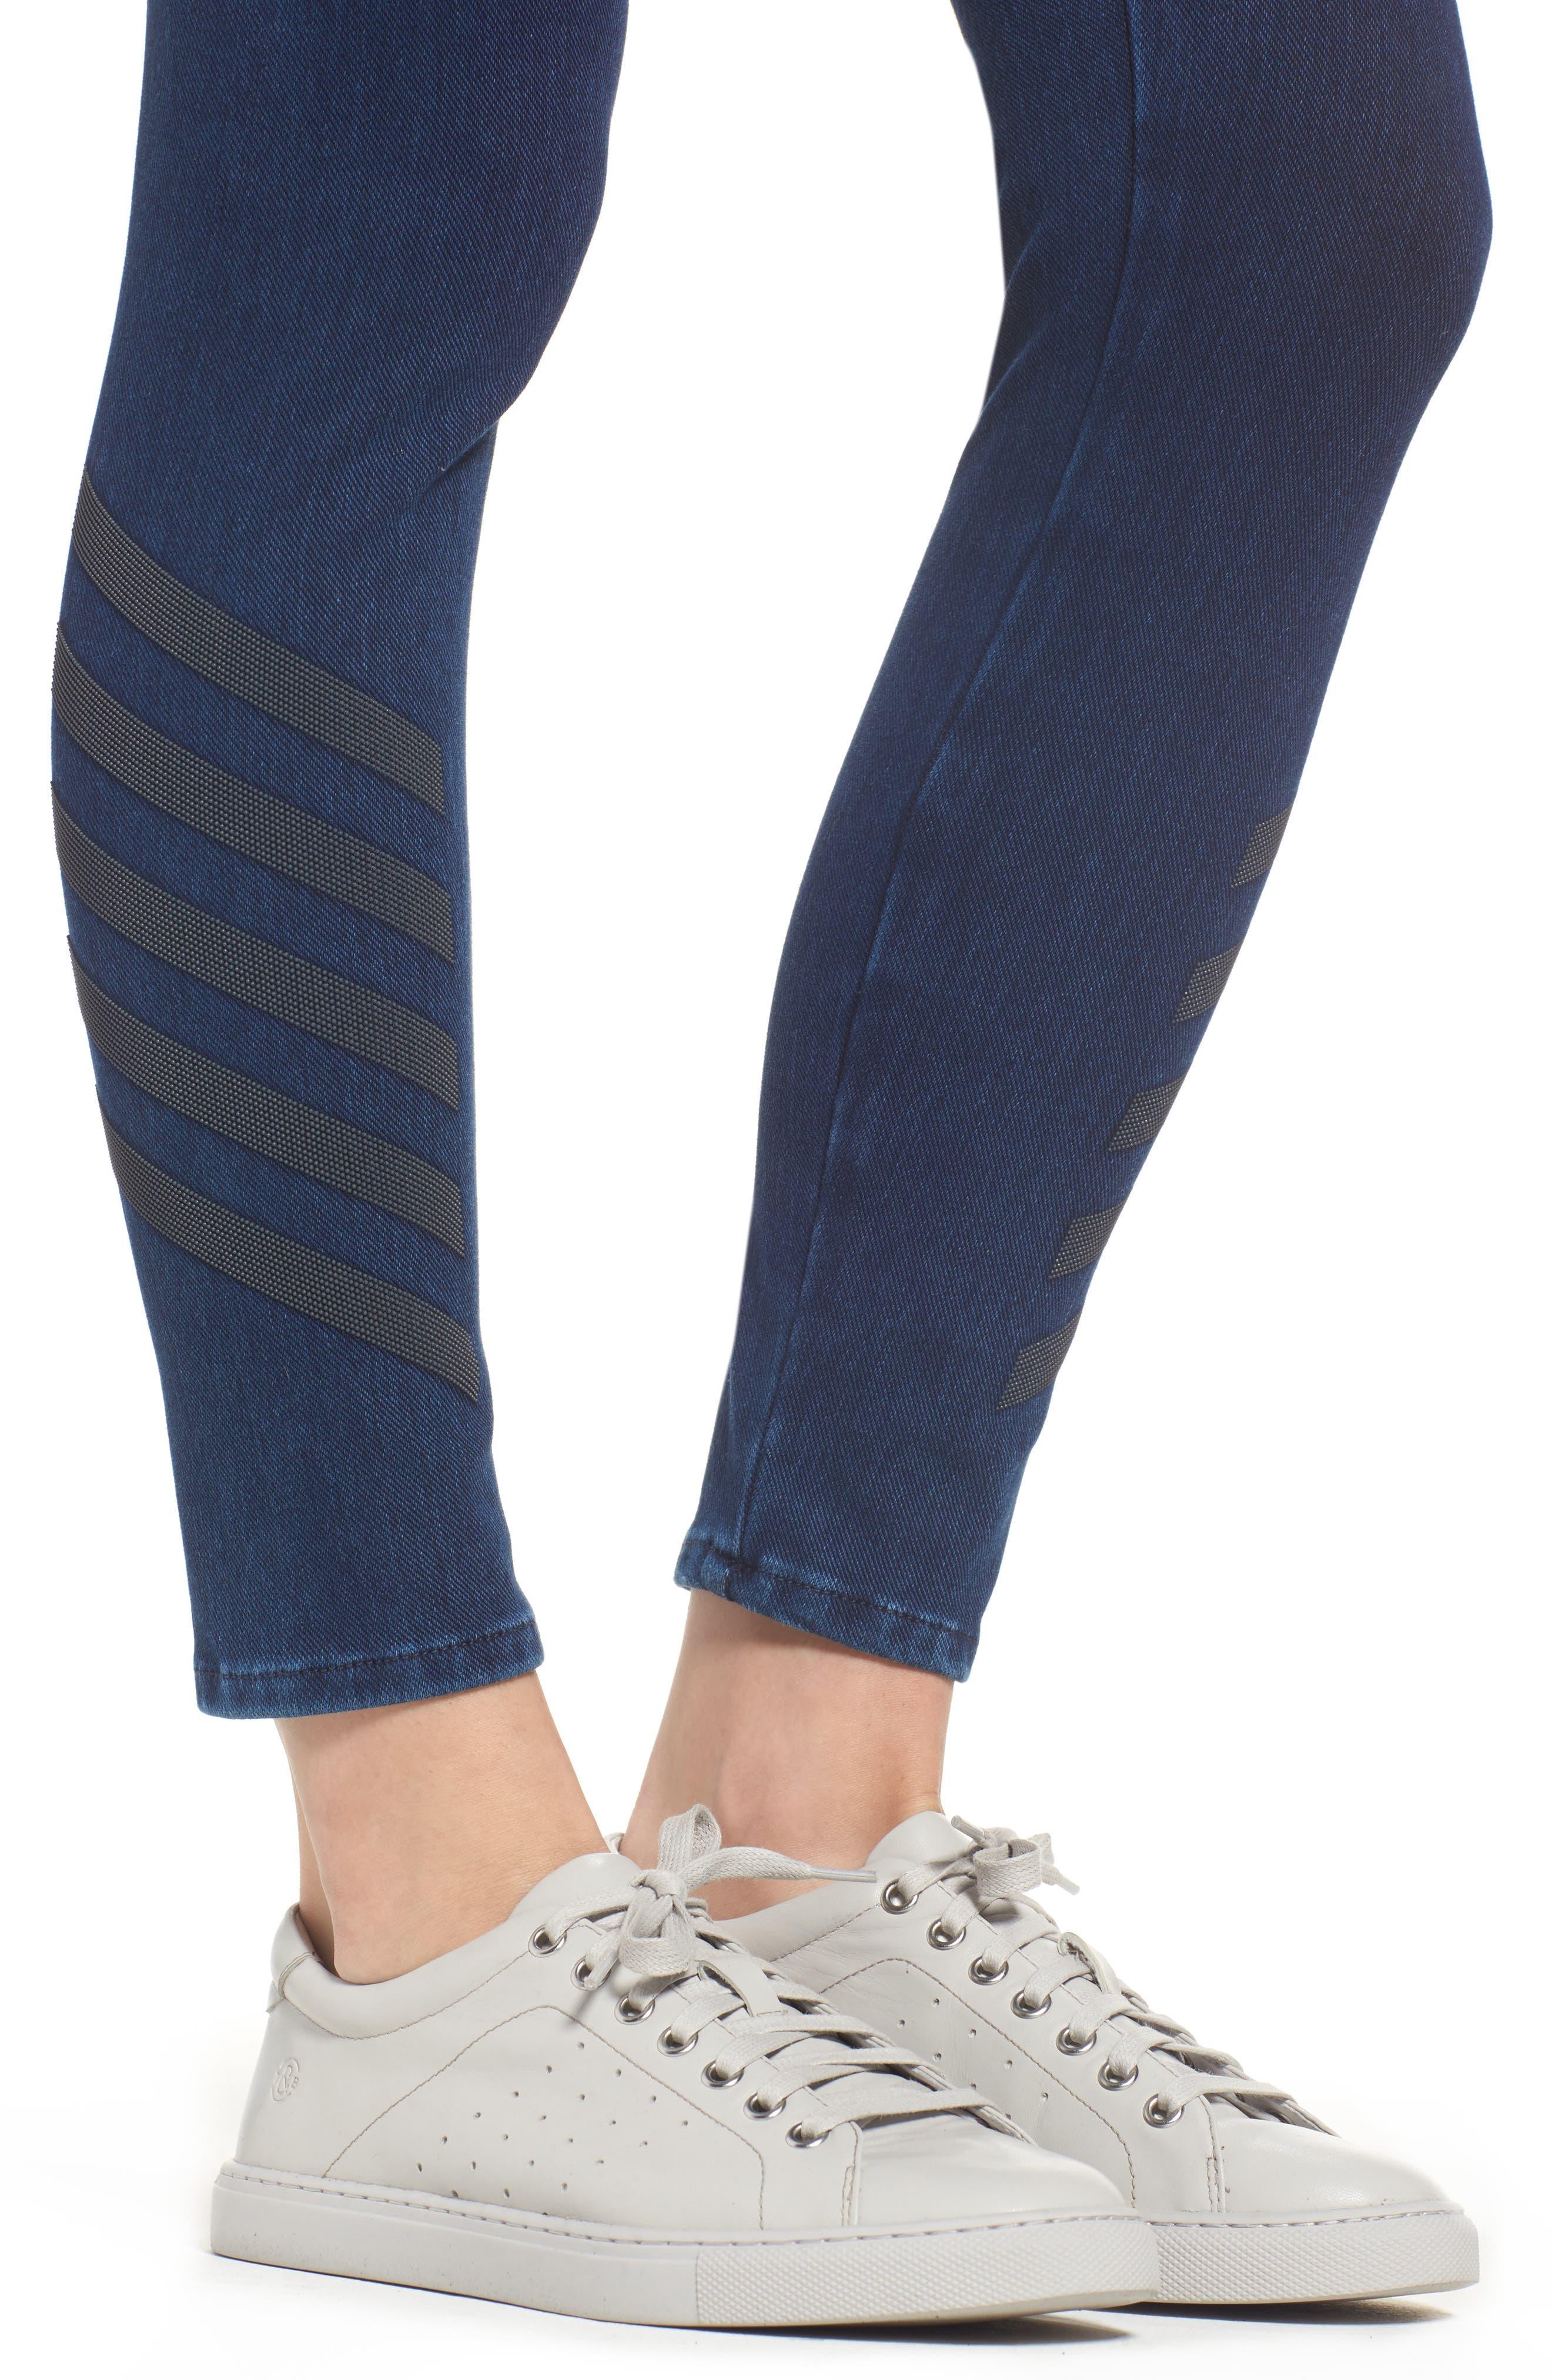 Joie Embellished High Waist Skinny Jeans,                             Alternate thumbnail 4, color,                             401